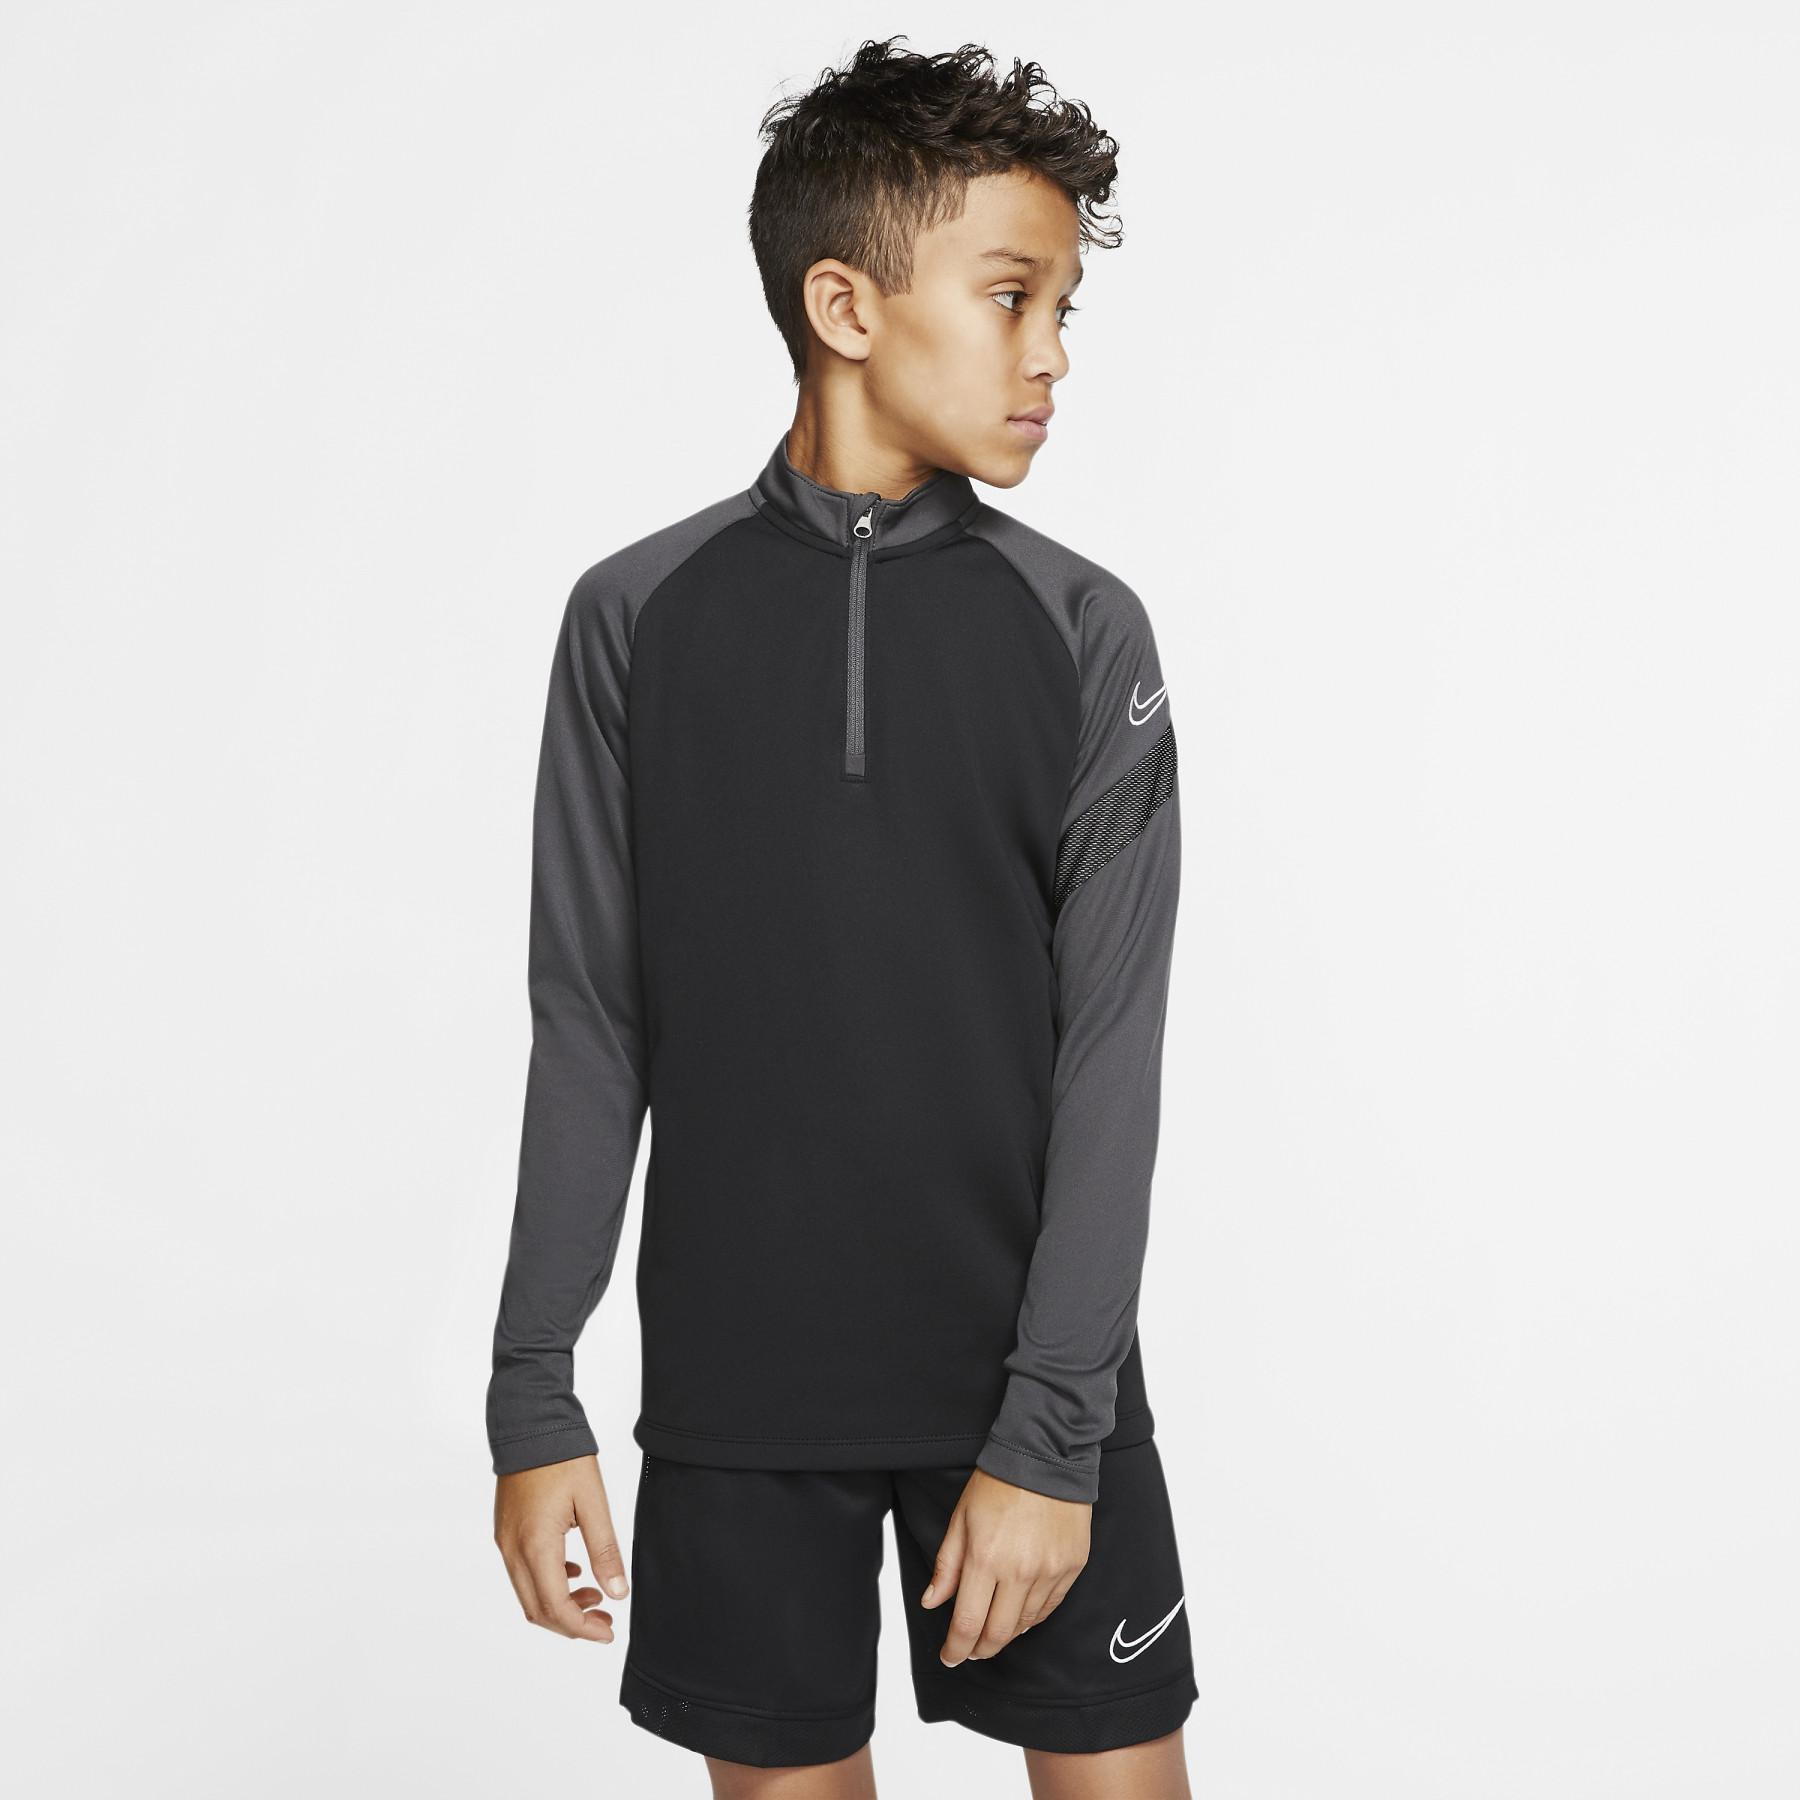 Children's jersey Nike Dri-FIT Academy Pro